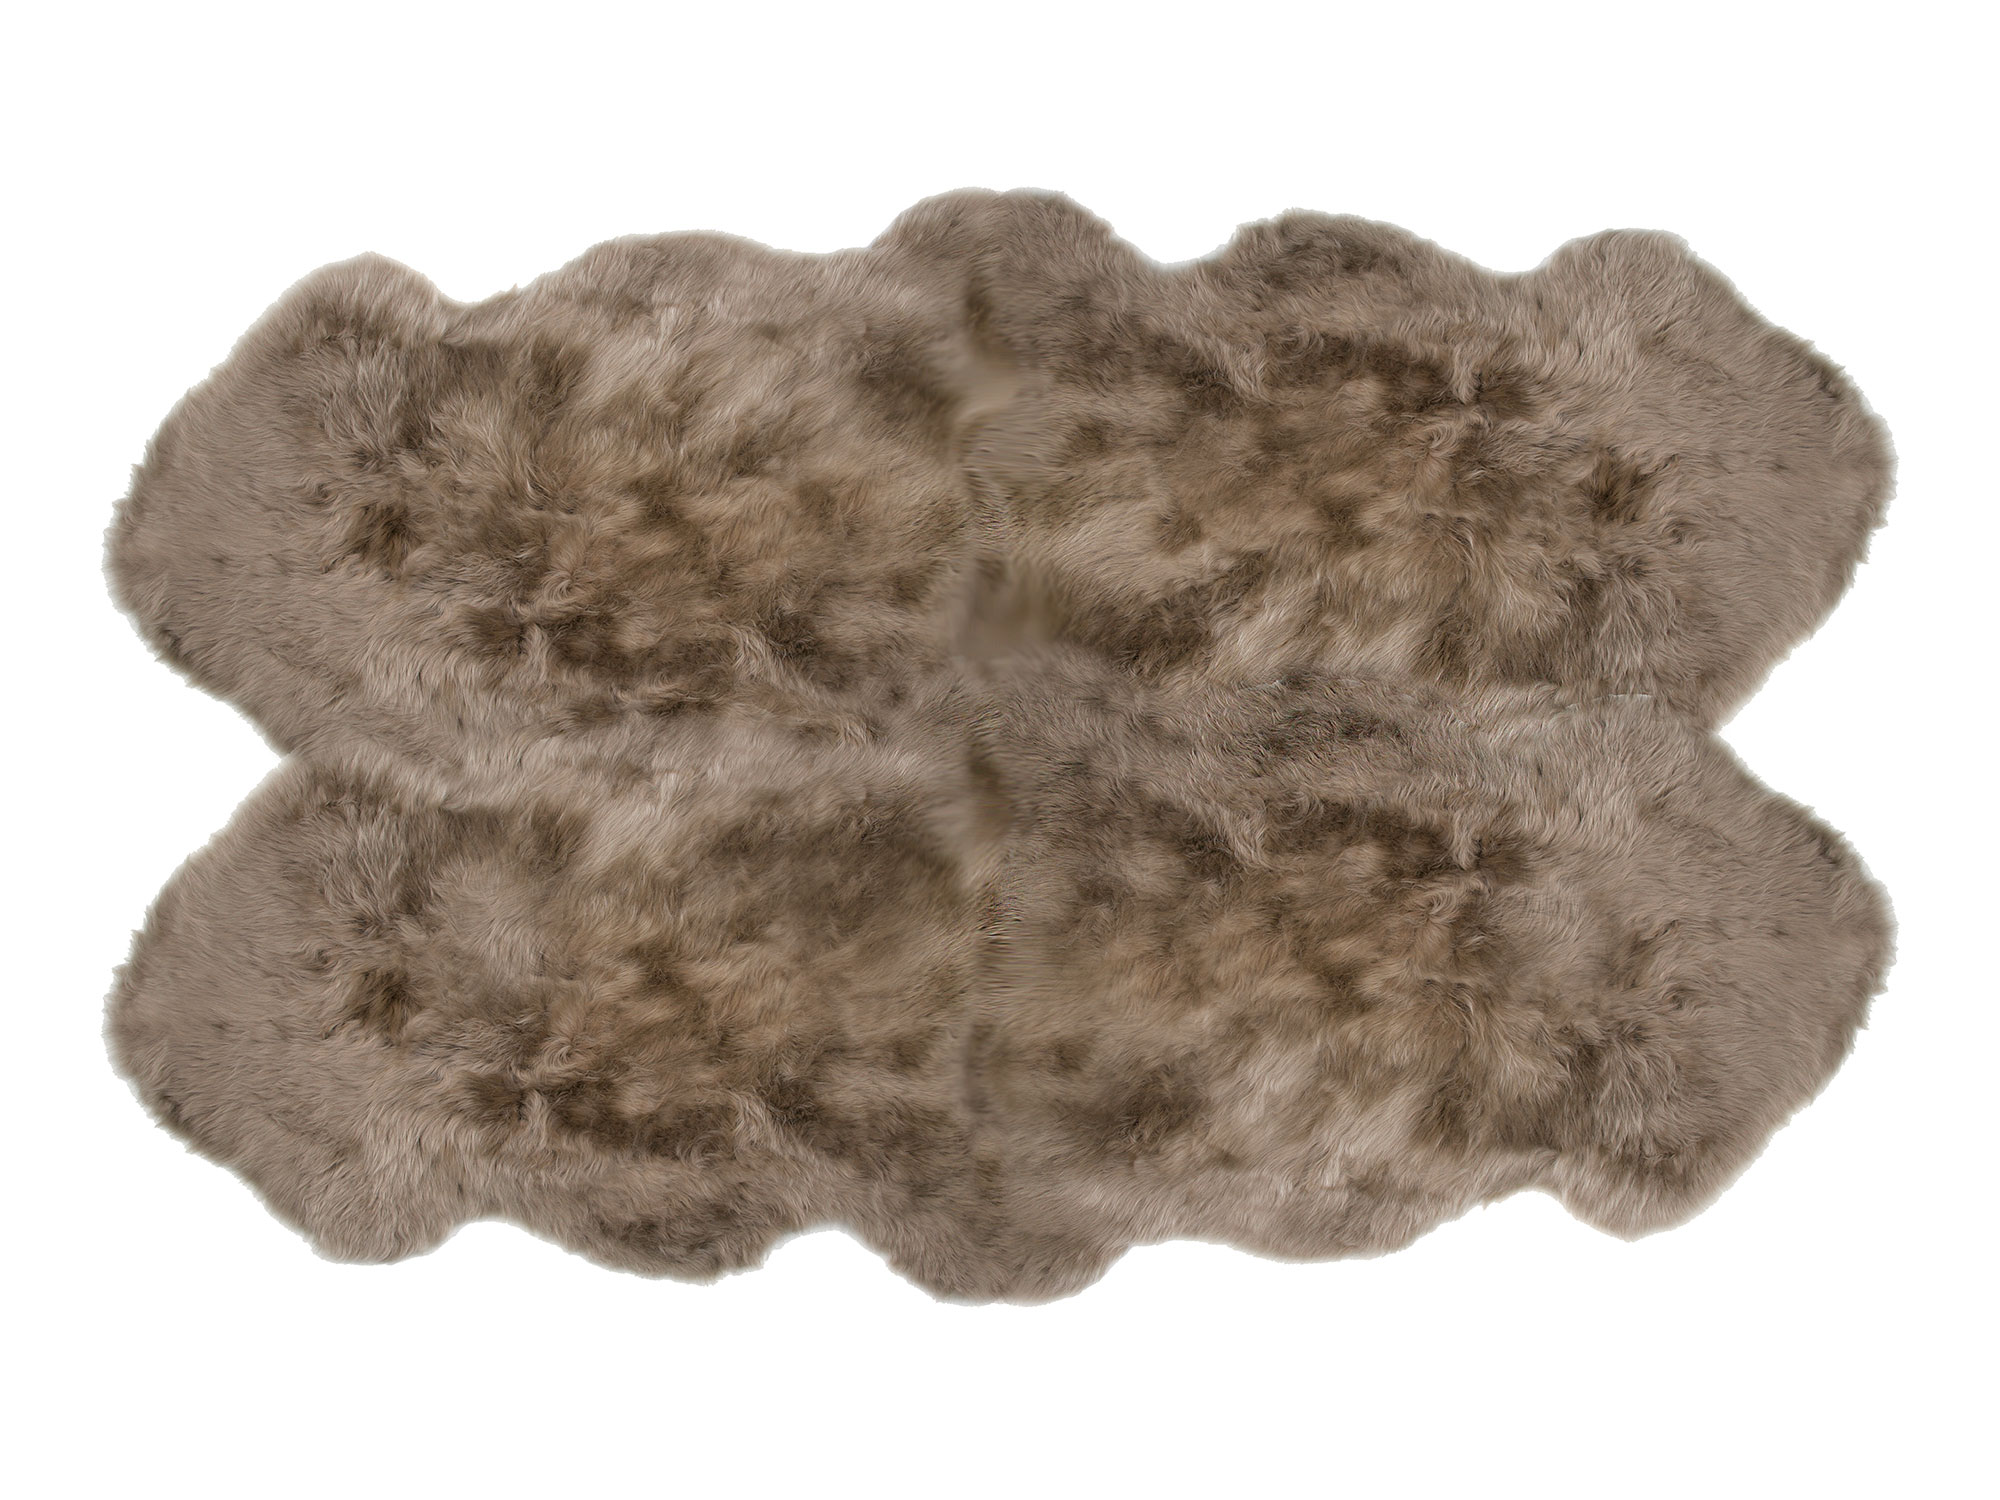 Sheepskin Rug 4 Pelt Taupe